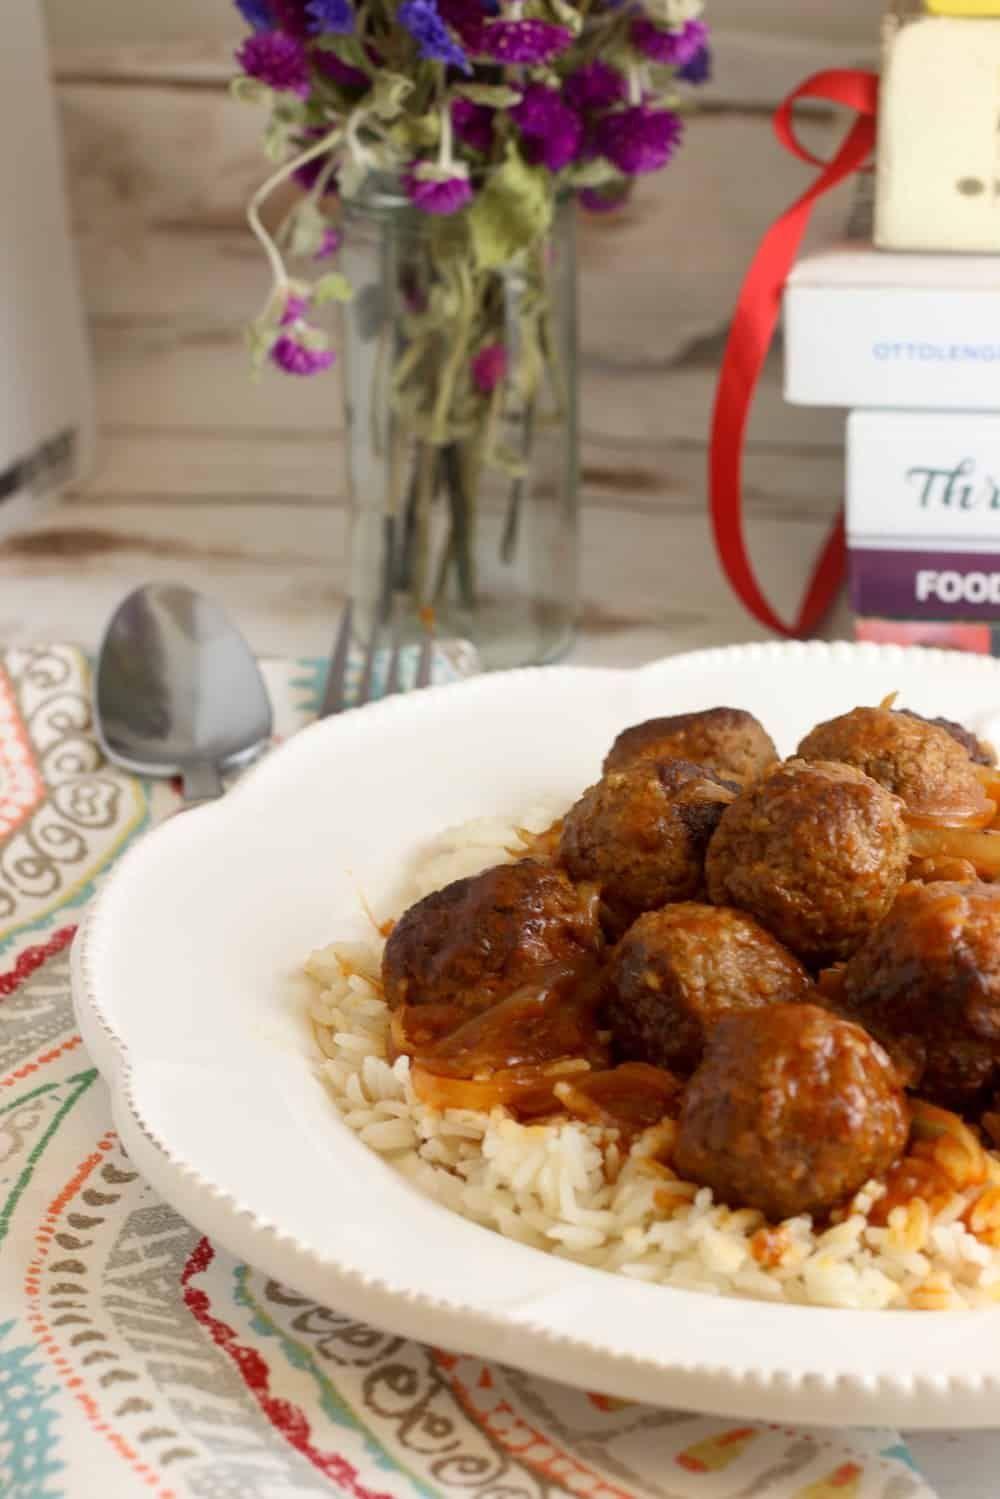 Basha Oil Change >> Fast Feast So What Should We Eat Part 1 Sweet Pillar